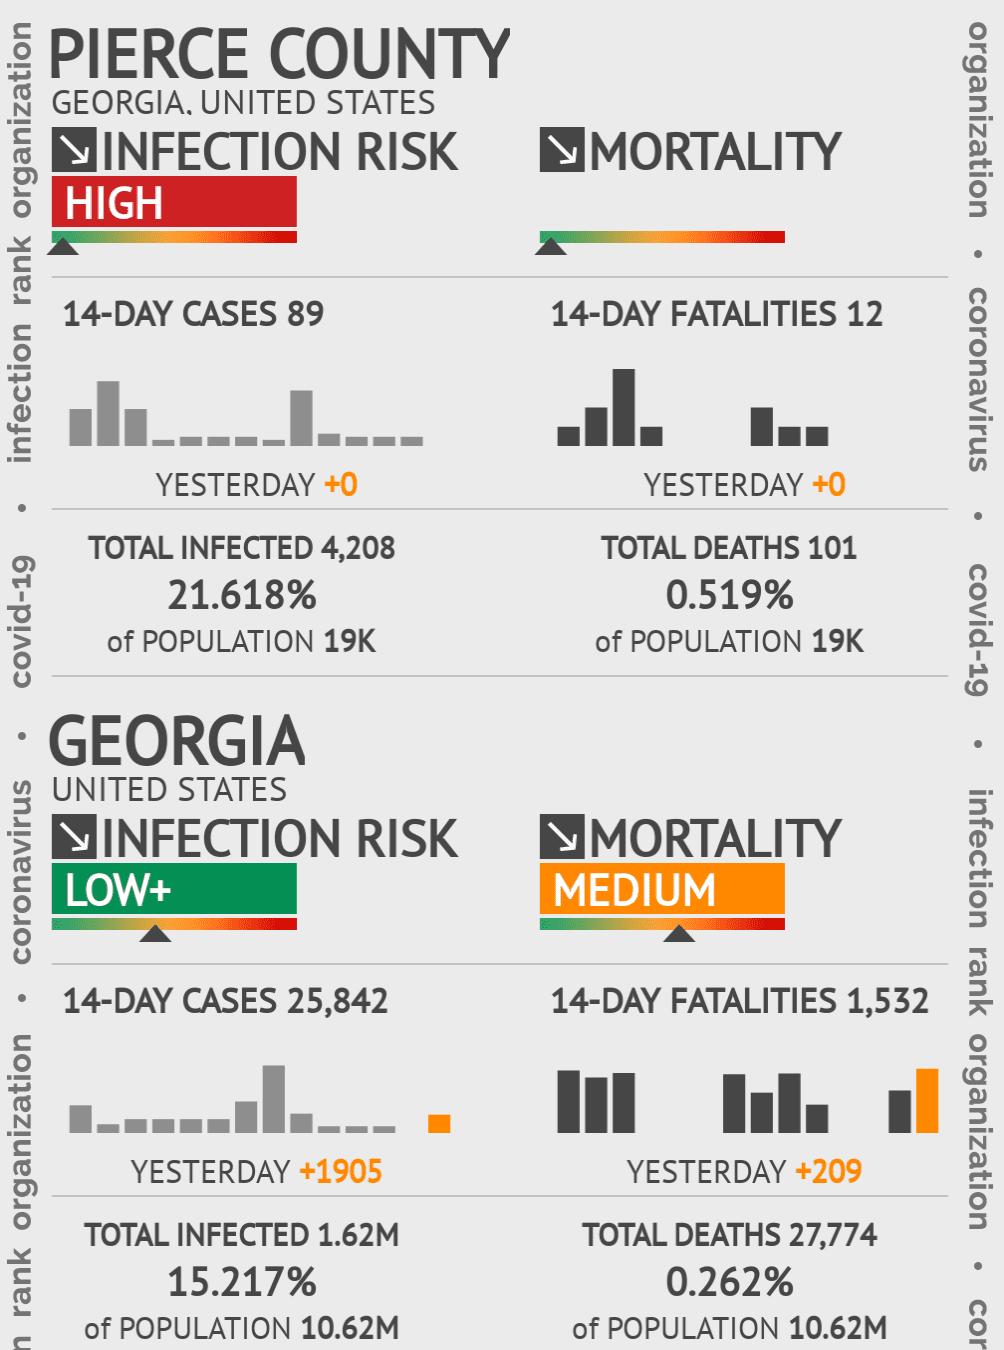 Pierce County Coronavirus Covid-19 Risk of Infection on February 25, 2021